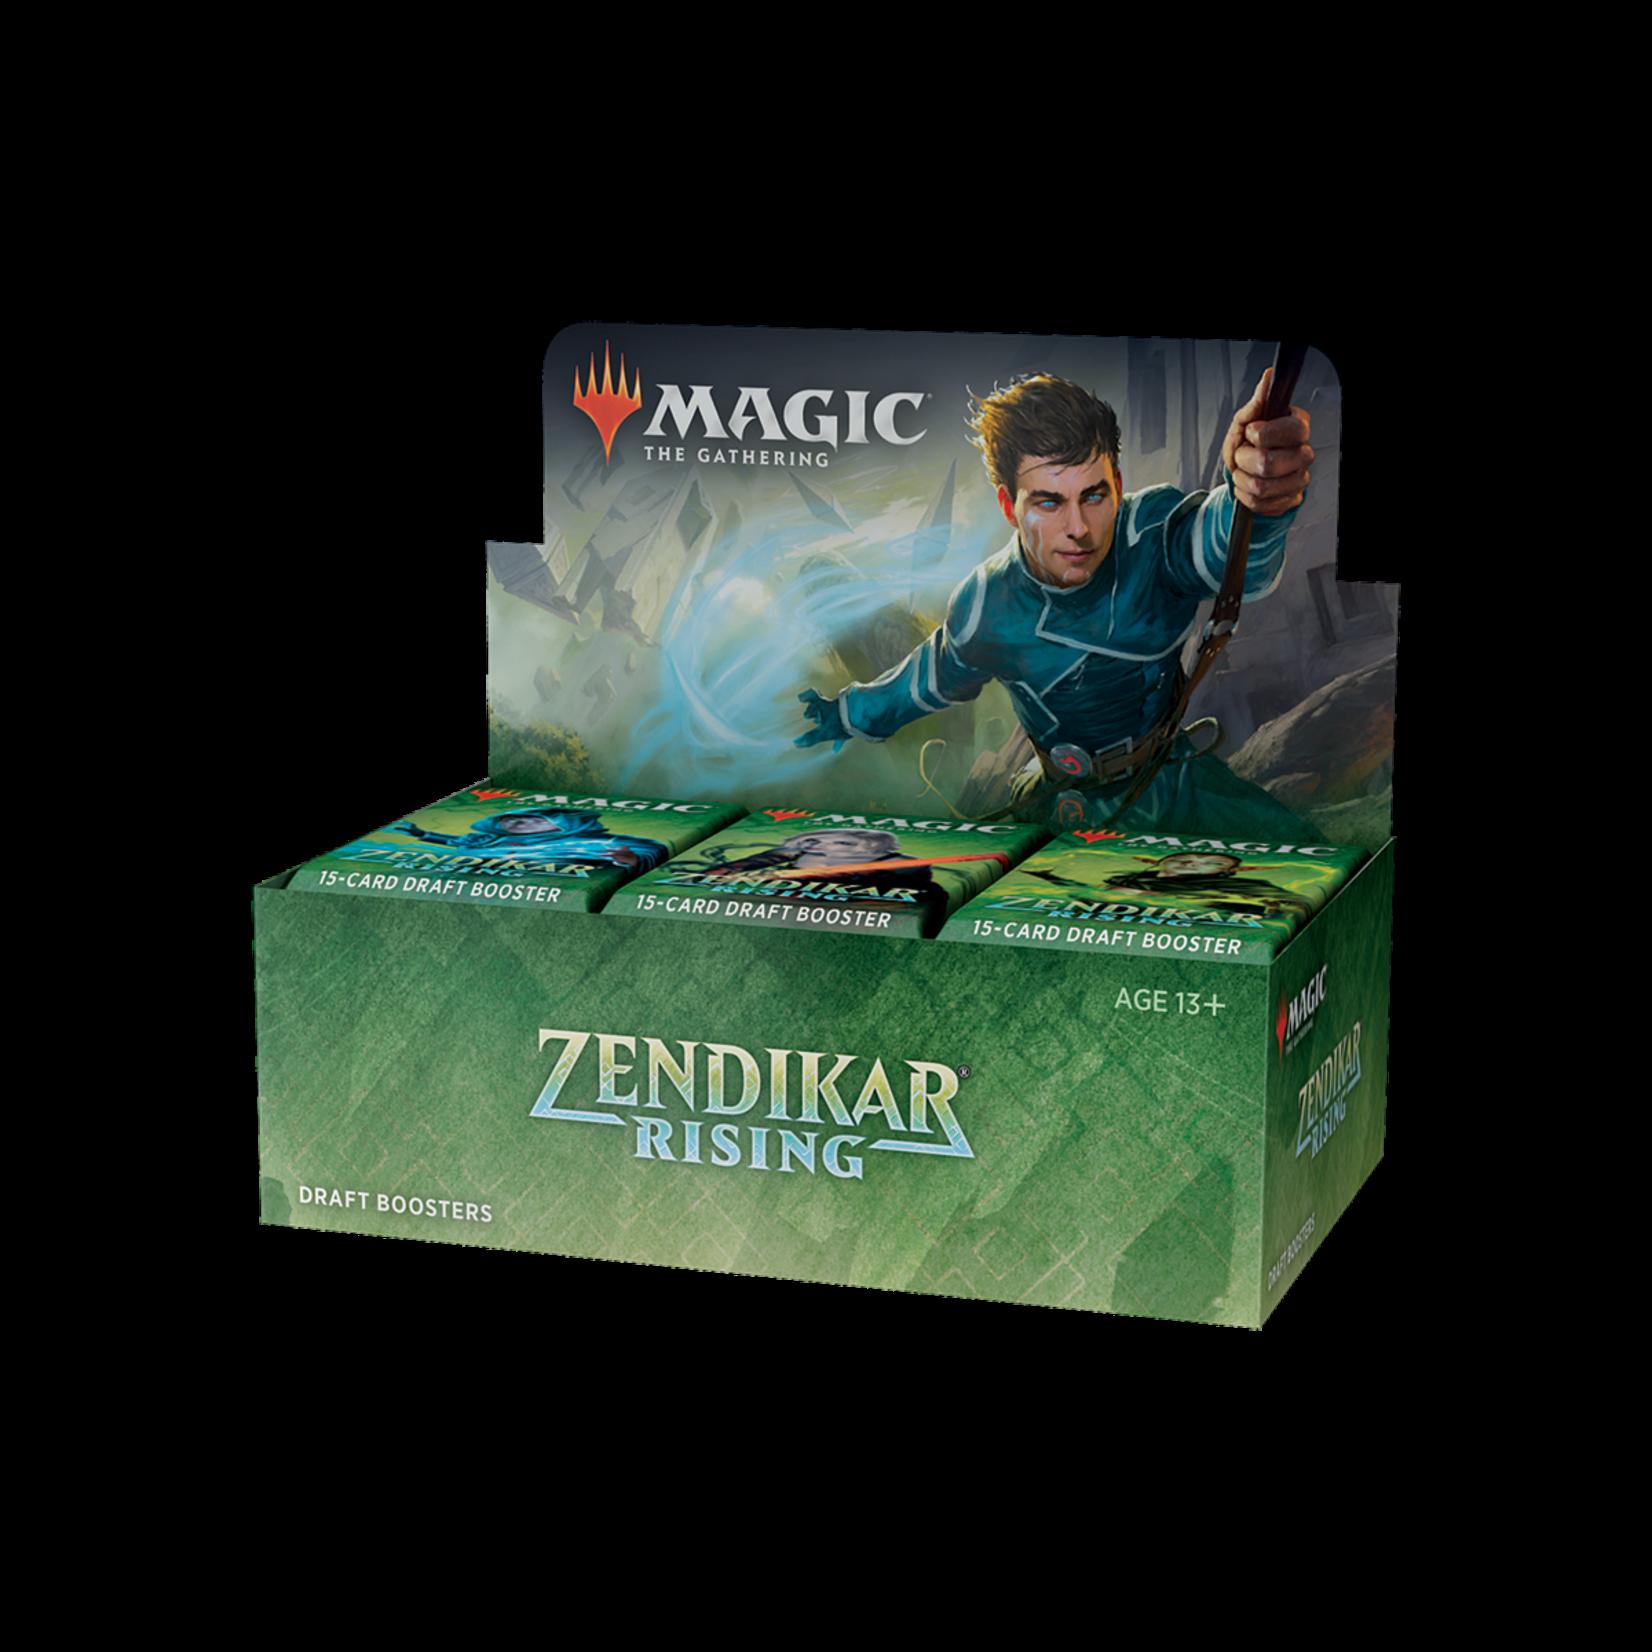 Wizards of the Coast Magic the Gathering: Zendikar Rising - Draft Booster Box